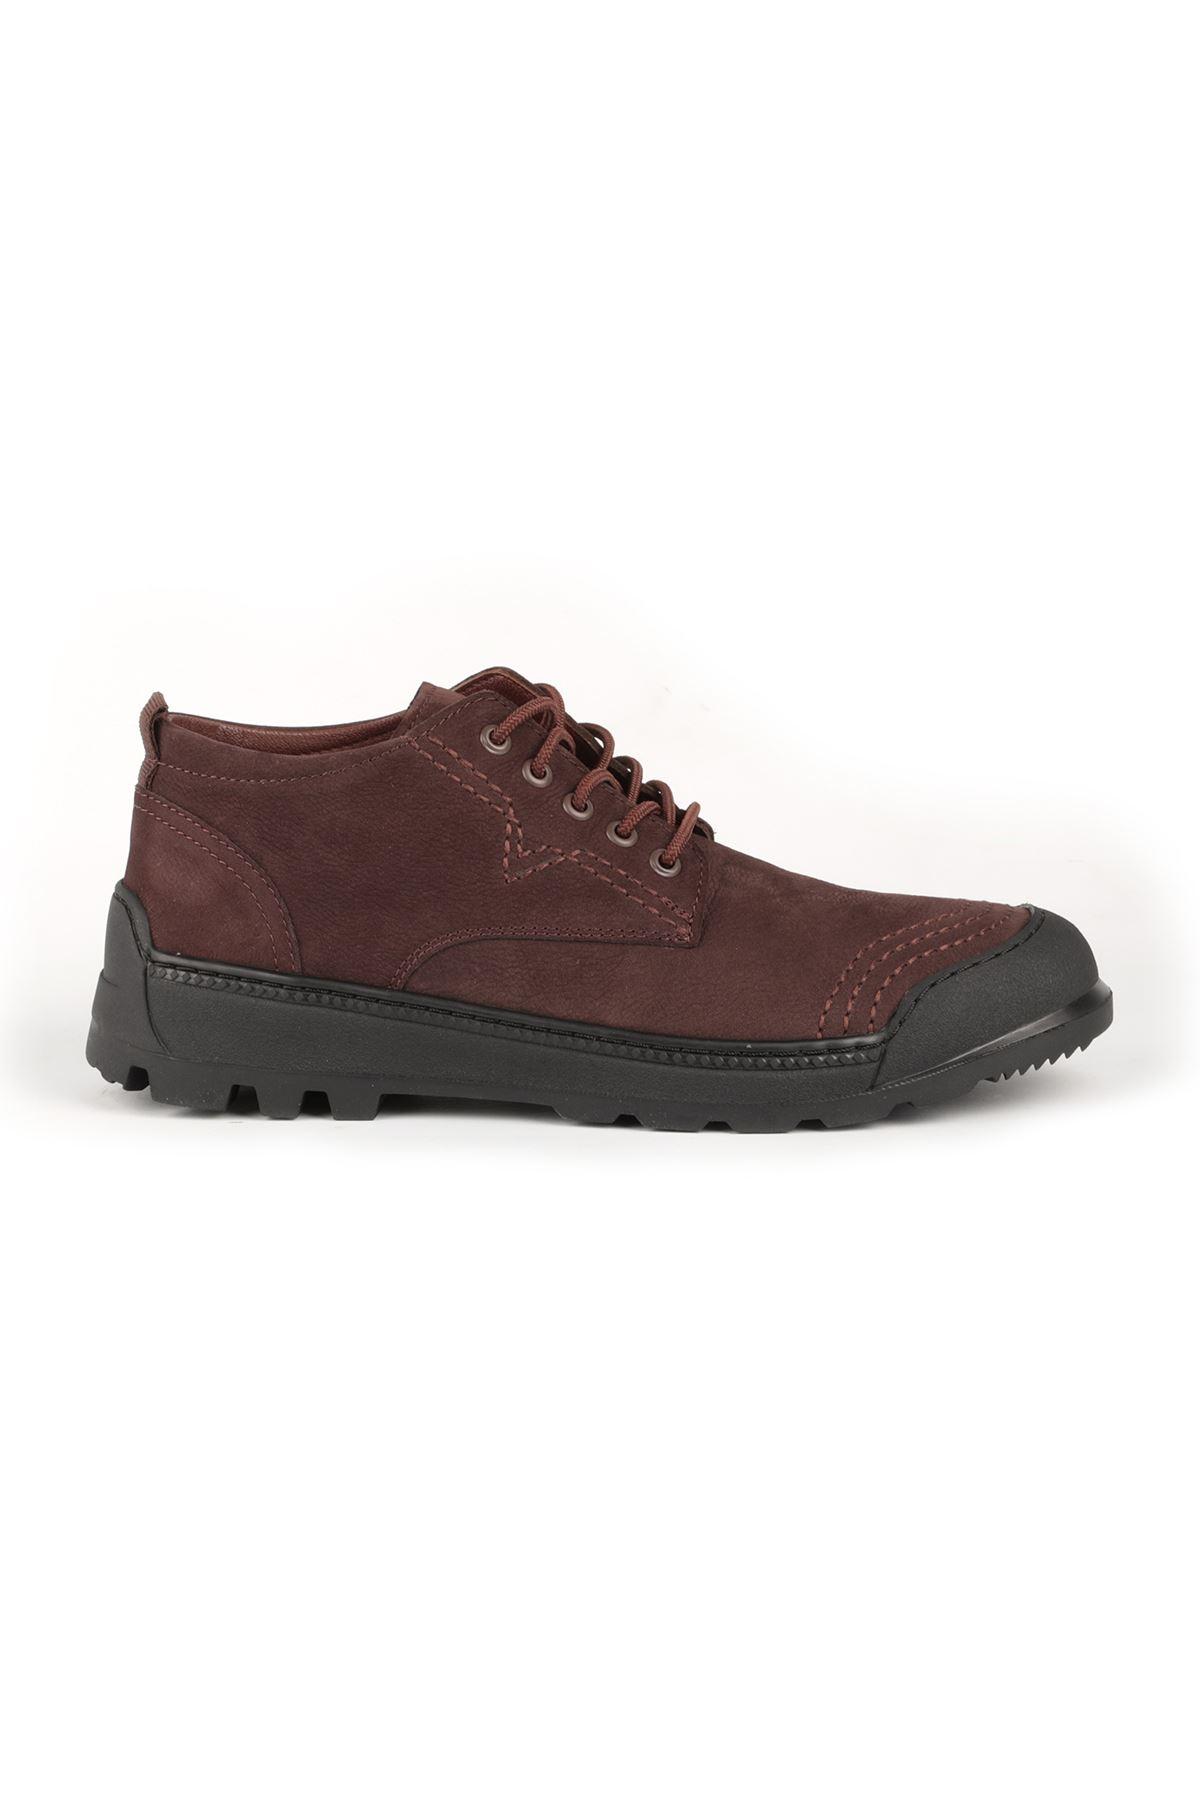 Libero L3485 Brown Sport Shoes